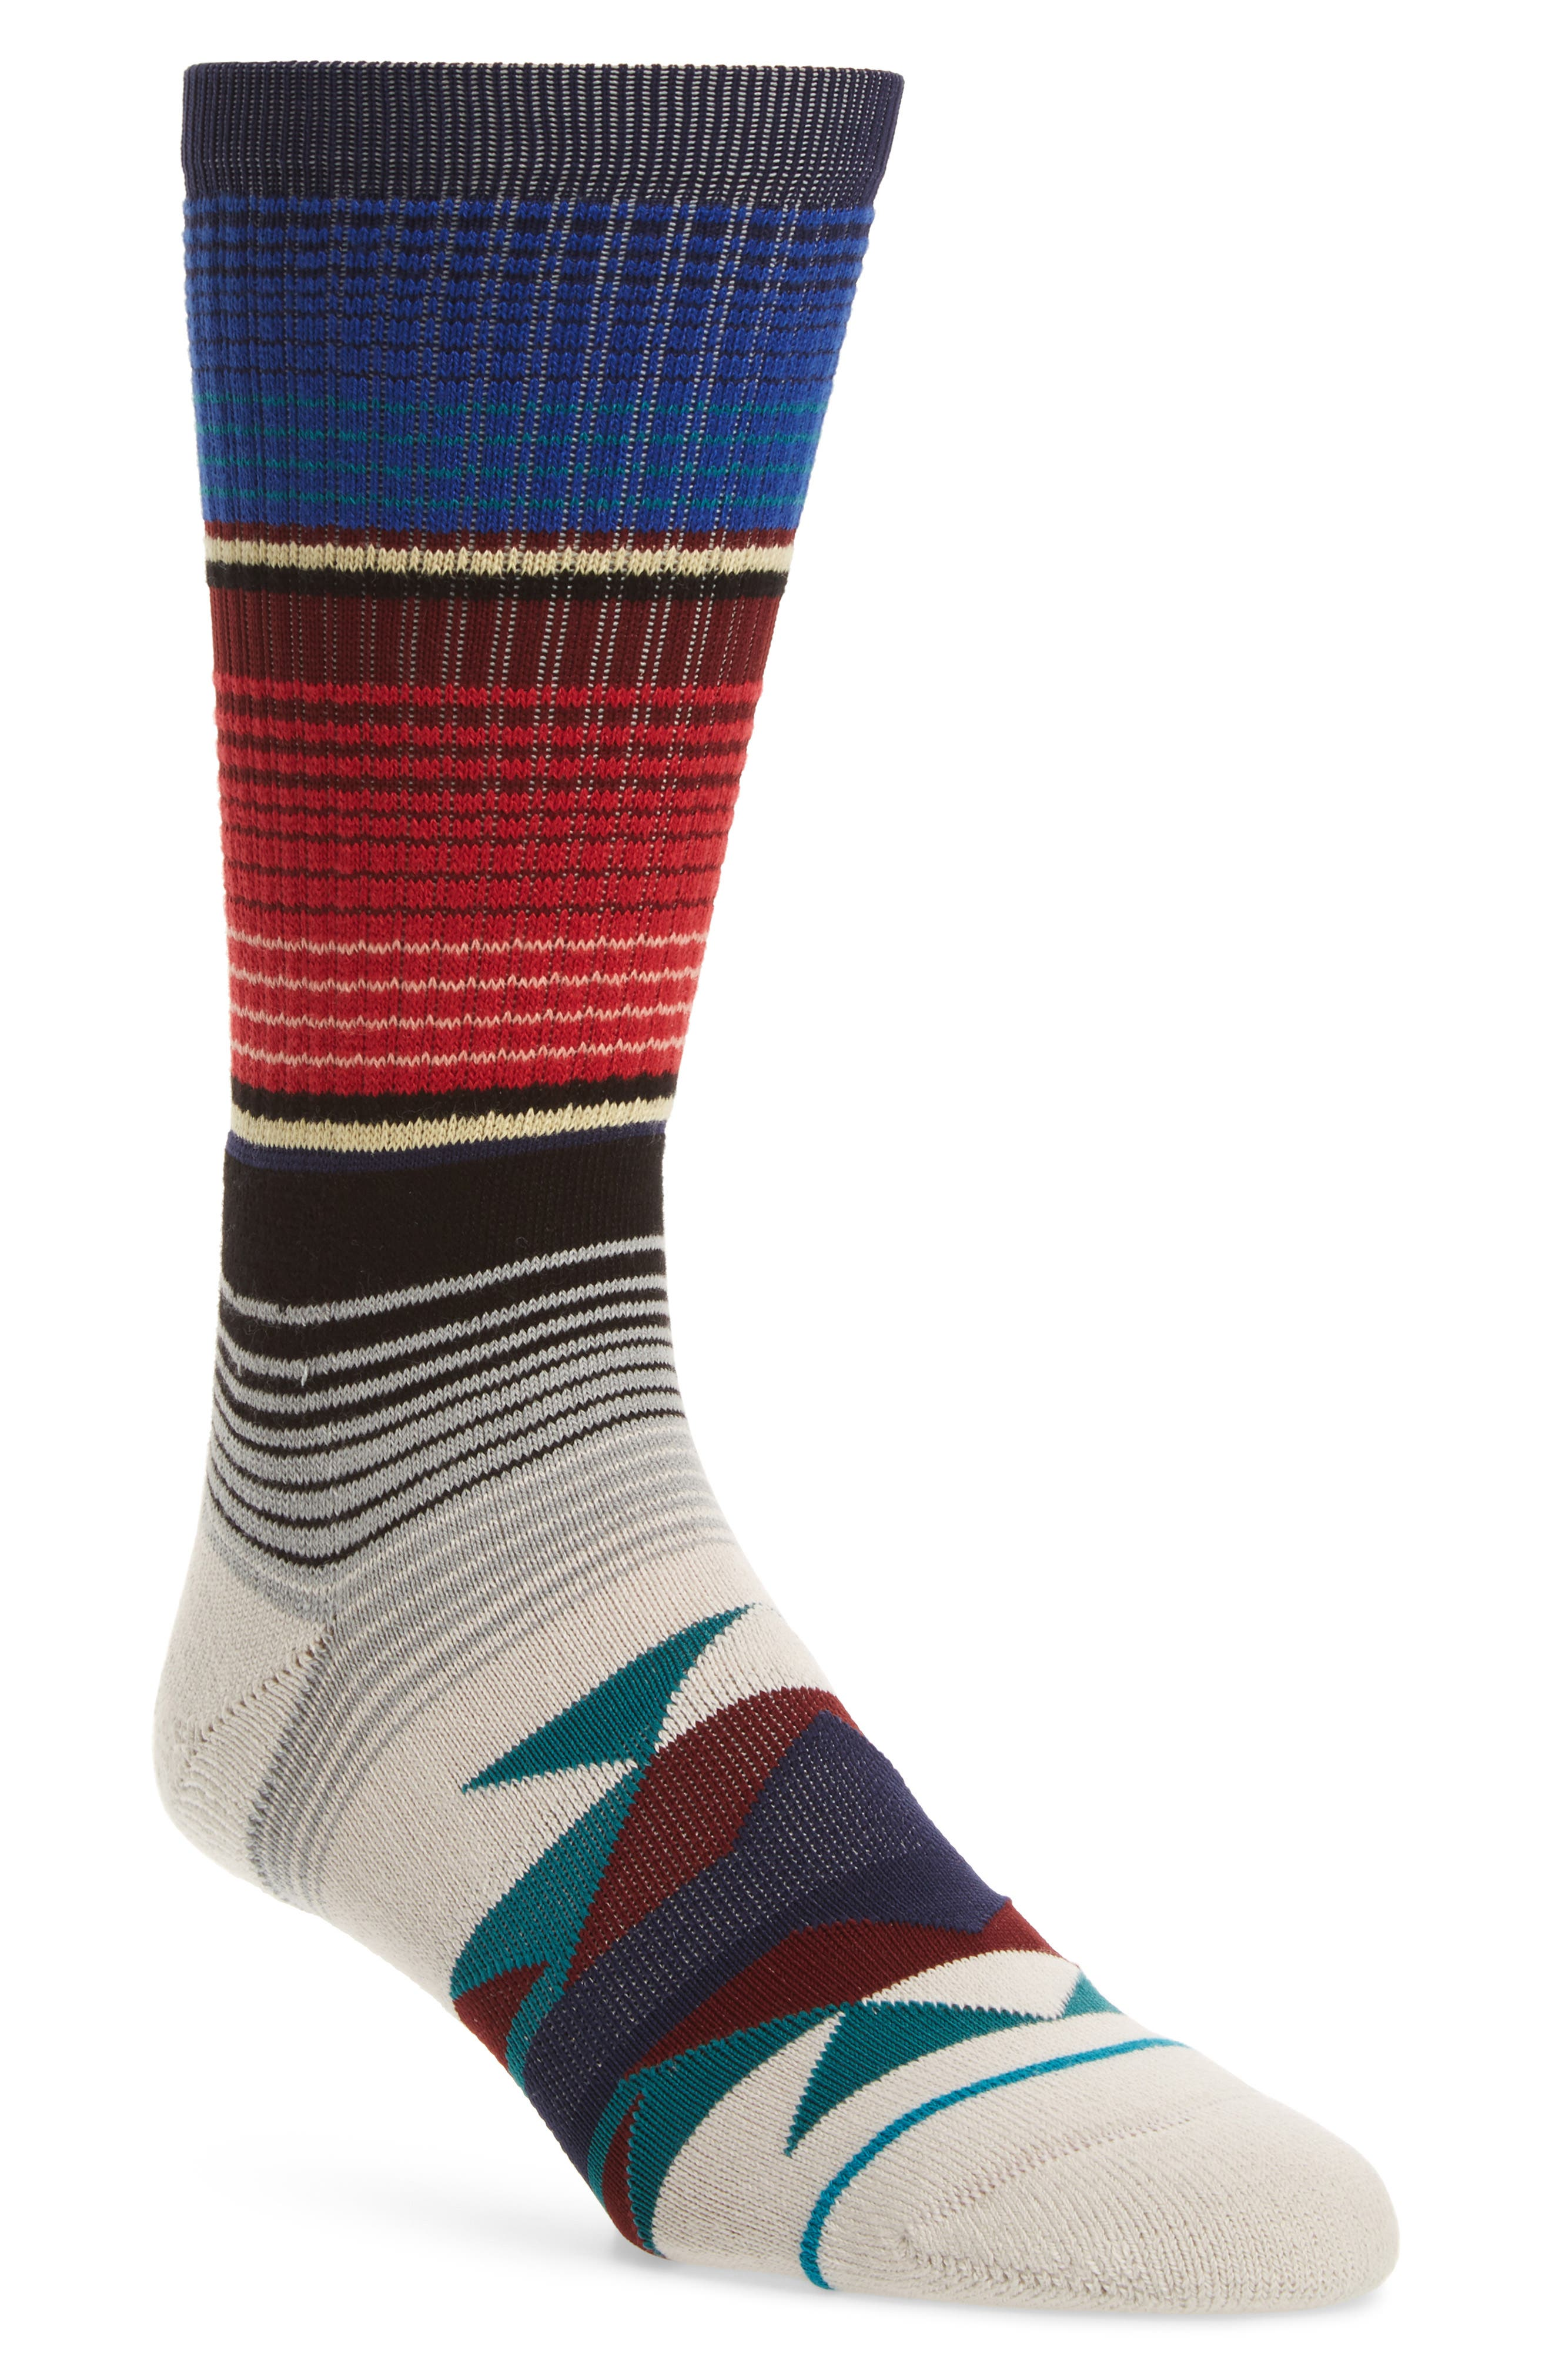 San Blas Crew Socks,                         Main,                         color, Teal